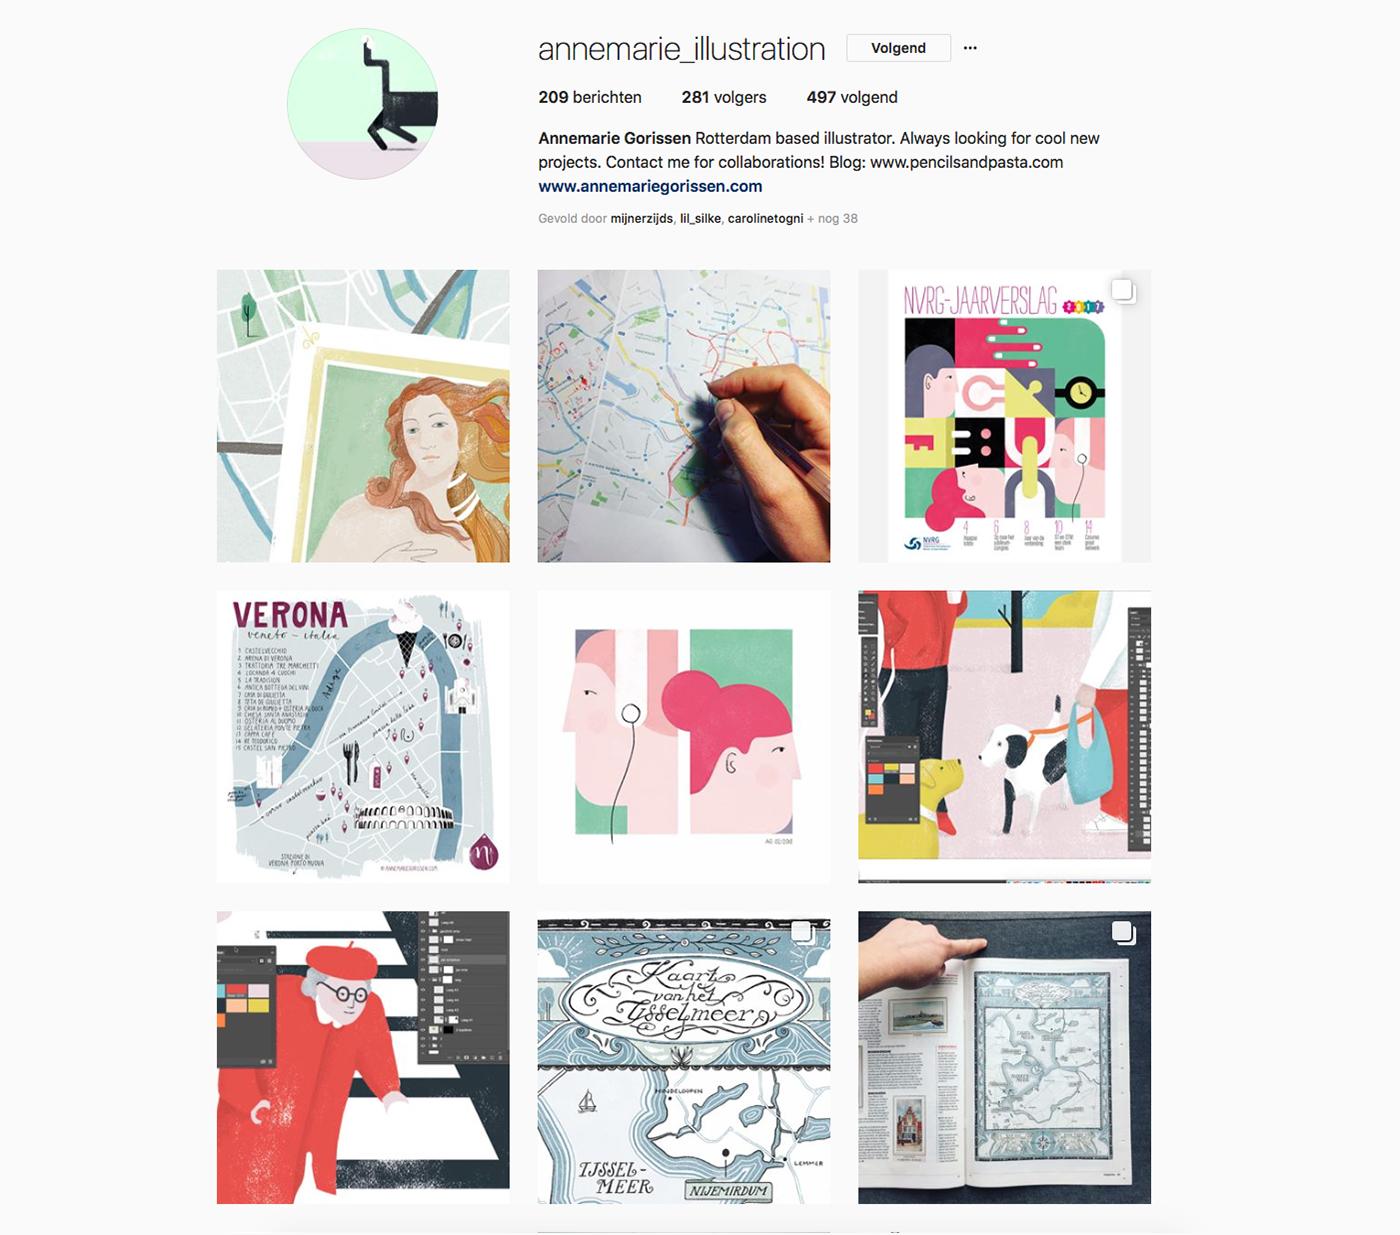 Instagram account of Annemarie Gorissen